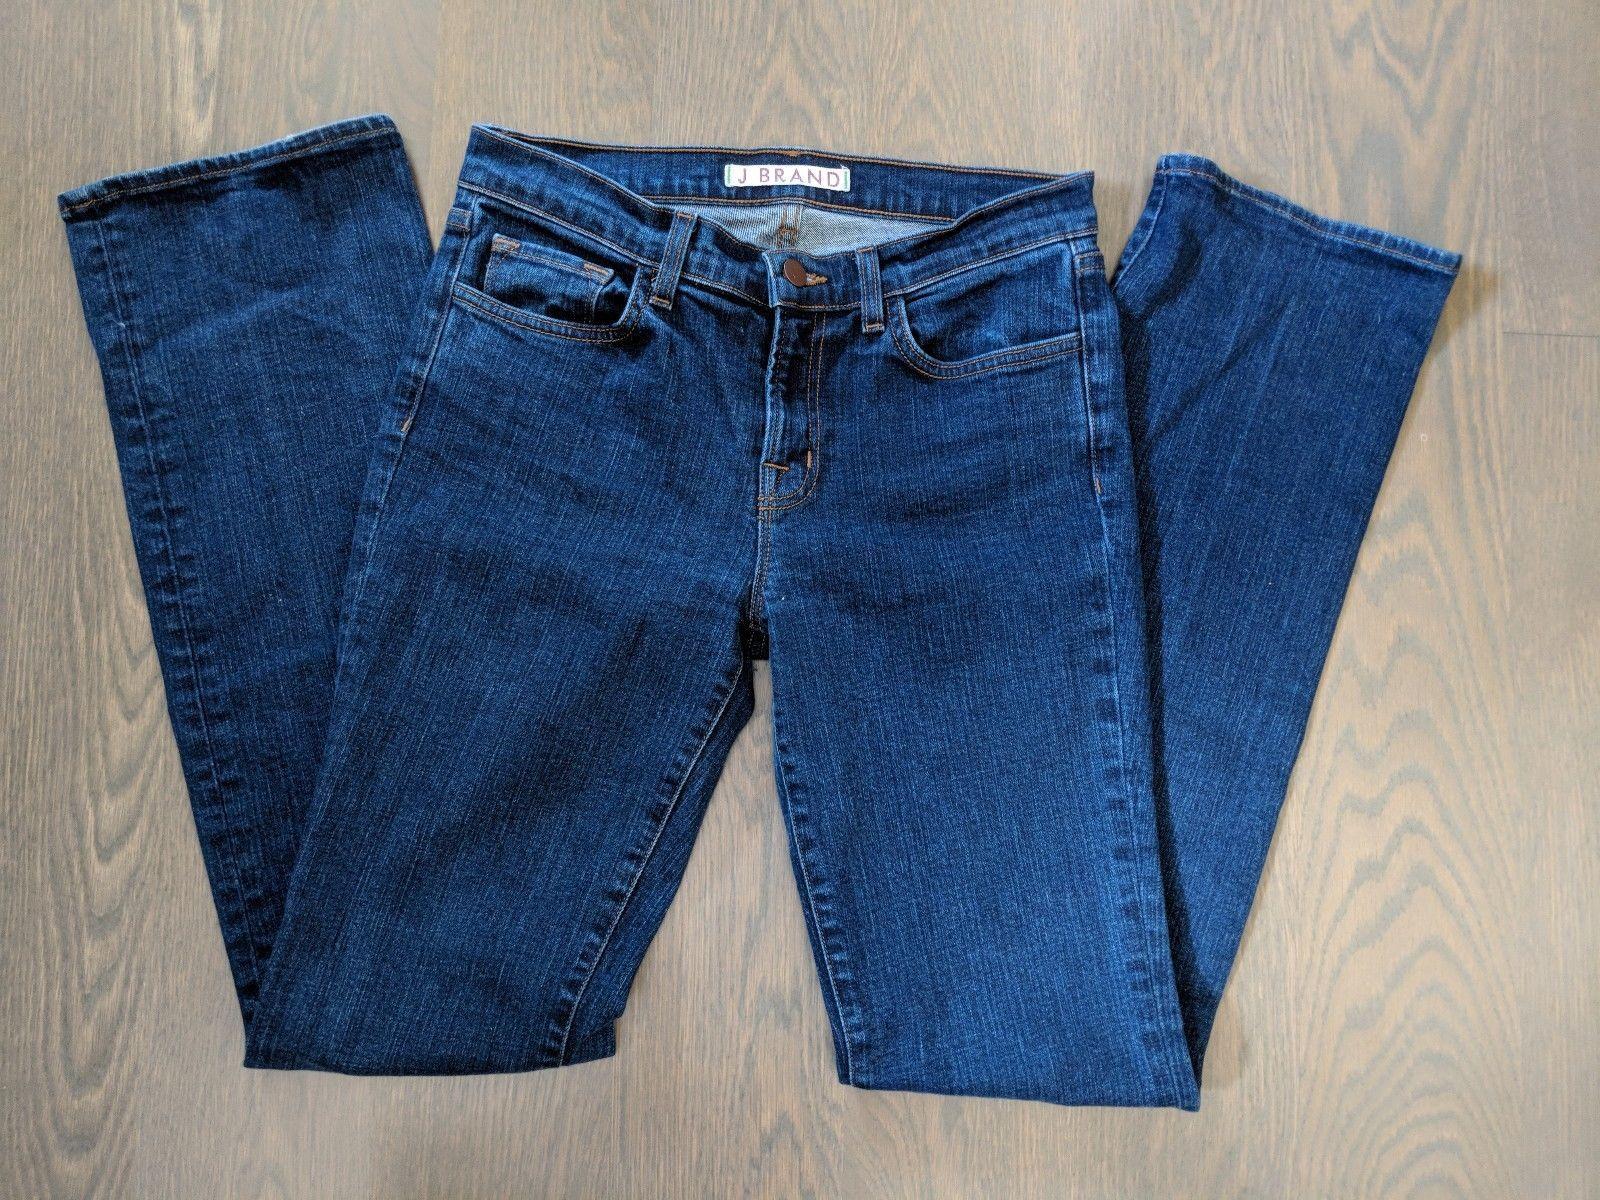 J Brand 28 Aruba Denim Skinny Slim Stretch Medium Wash Jeans Womens Pants image 2